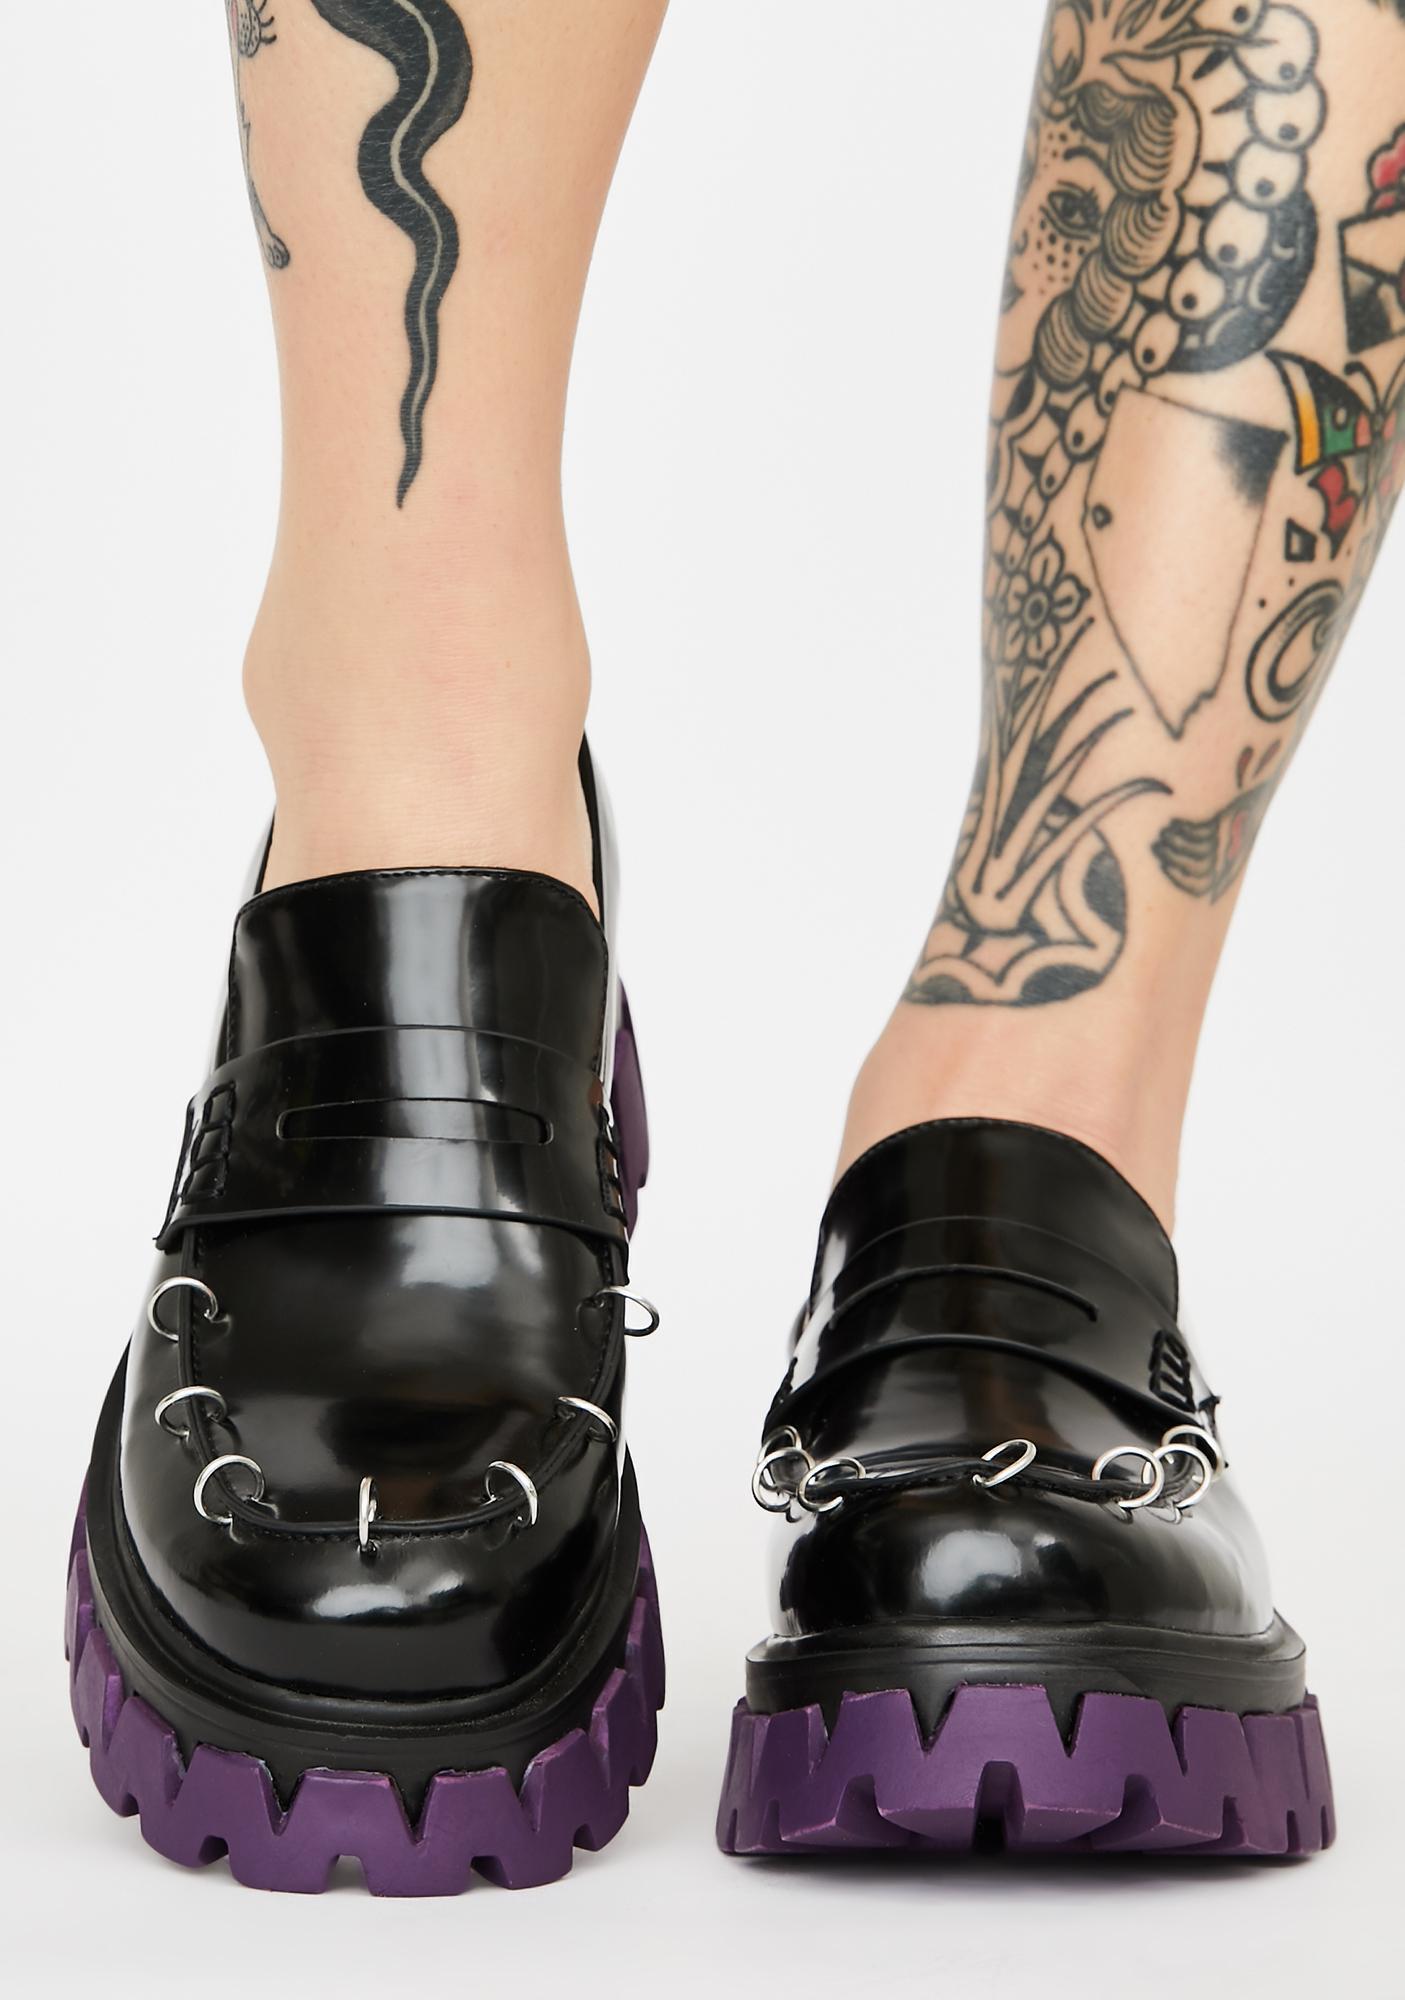 Koi Footwear Gensai O-Ring Loafers